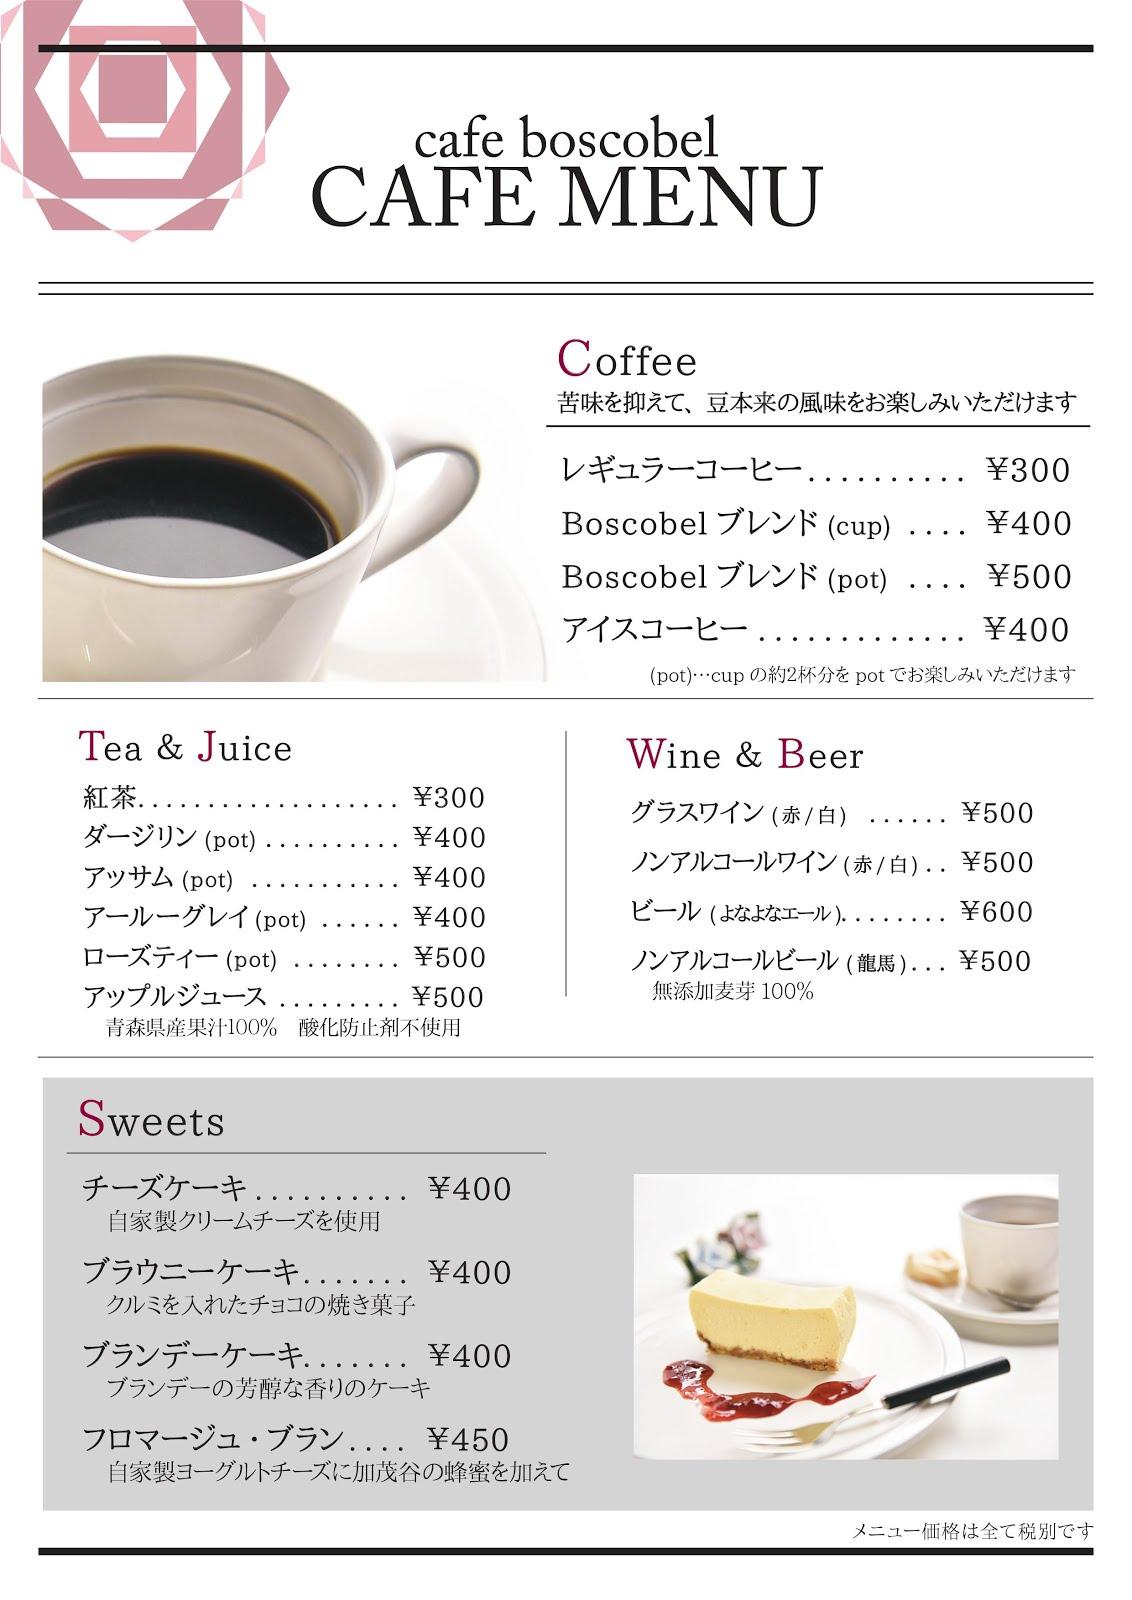 cafe boscobel - cafe menu